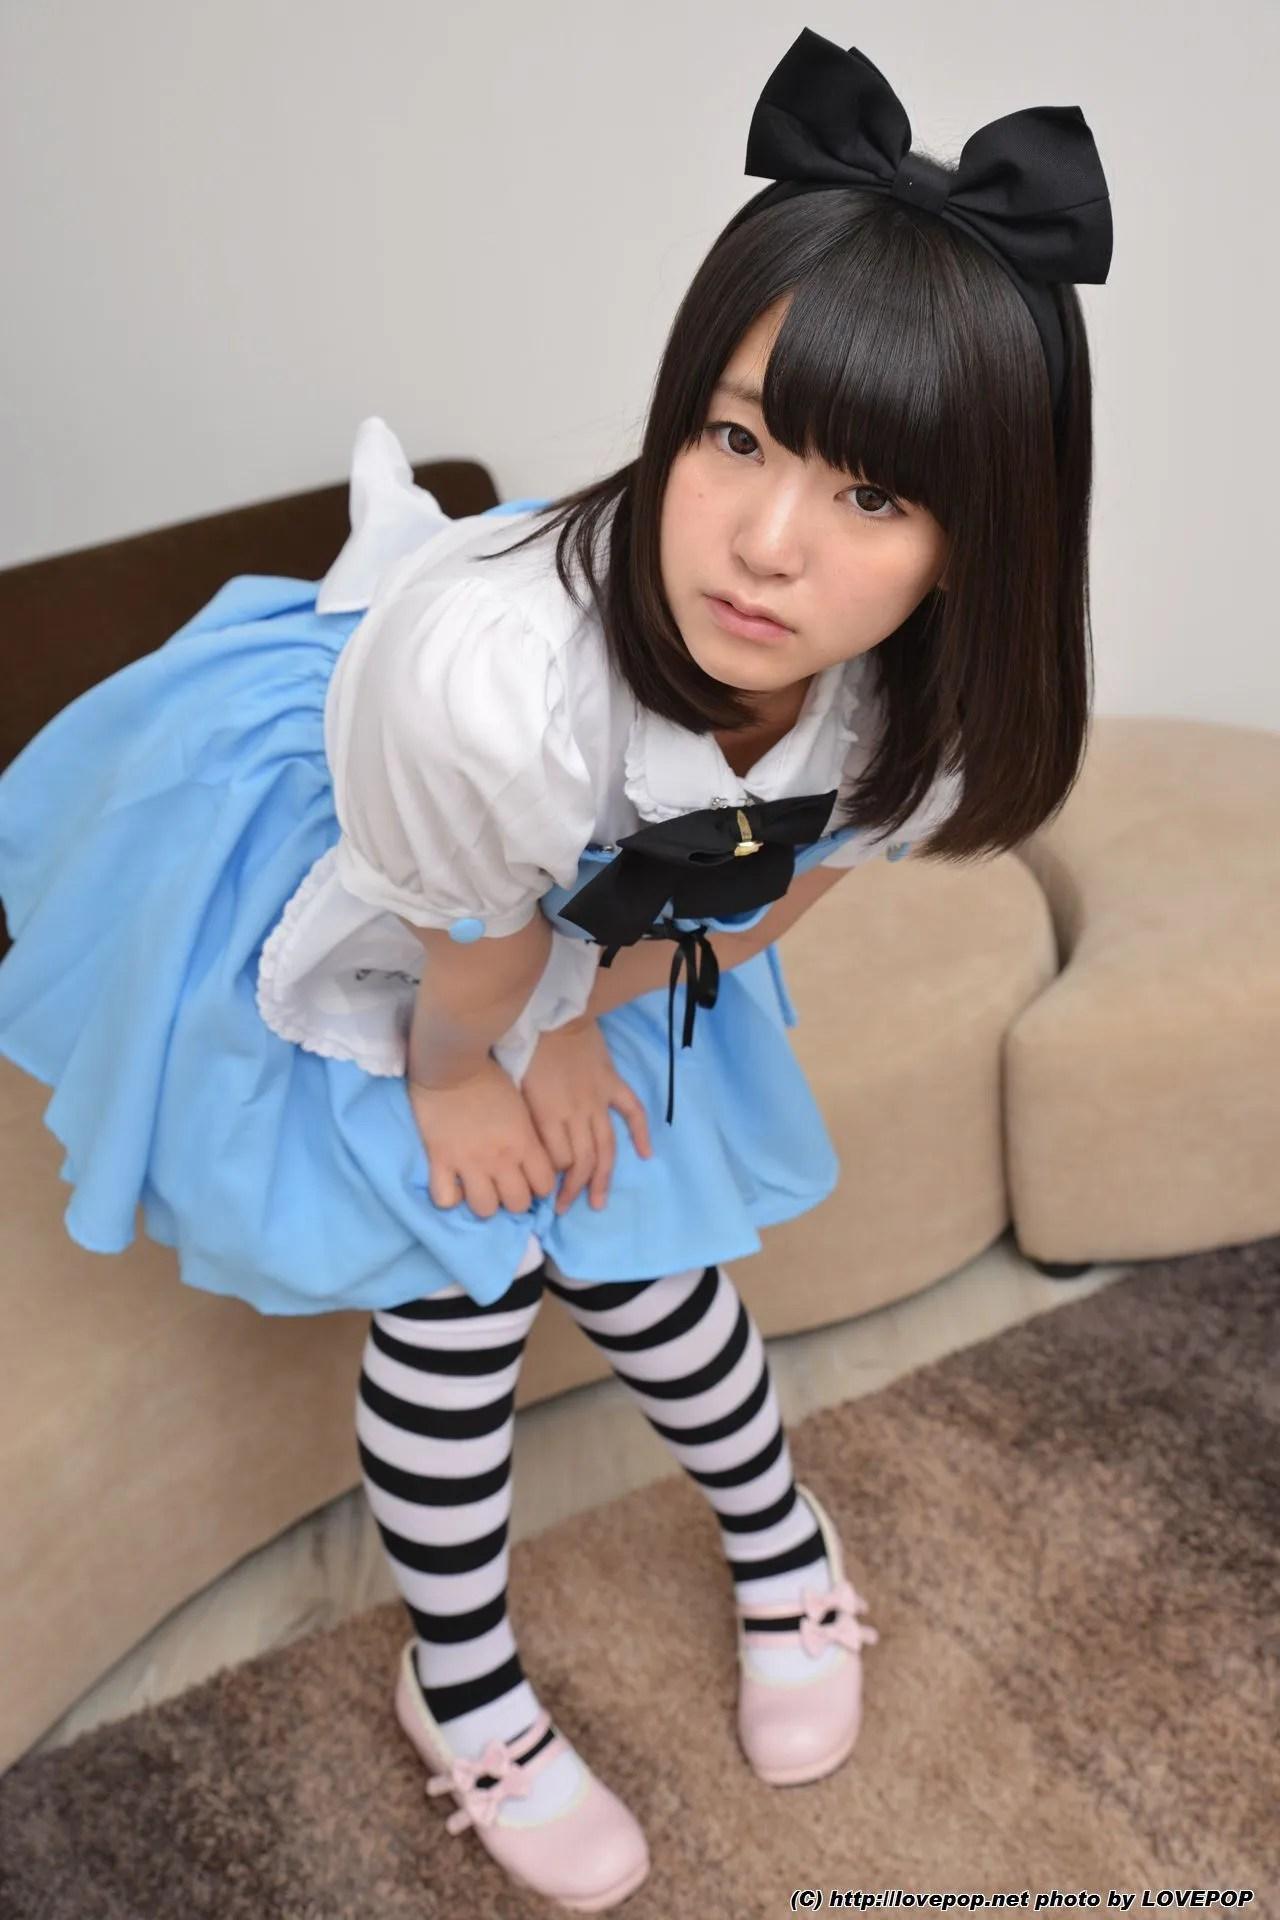 [LovePop] Tsuna Kimura 木村つな Maid Set03 写真集[65P]插图(5)